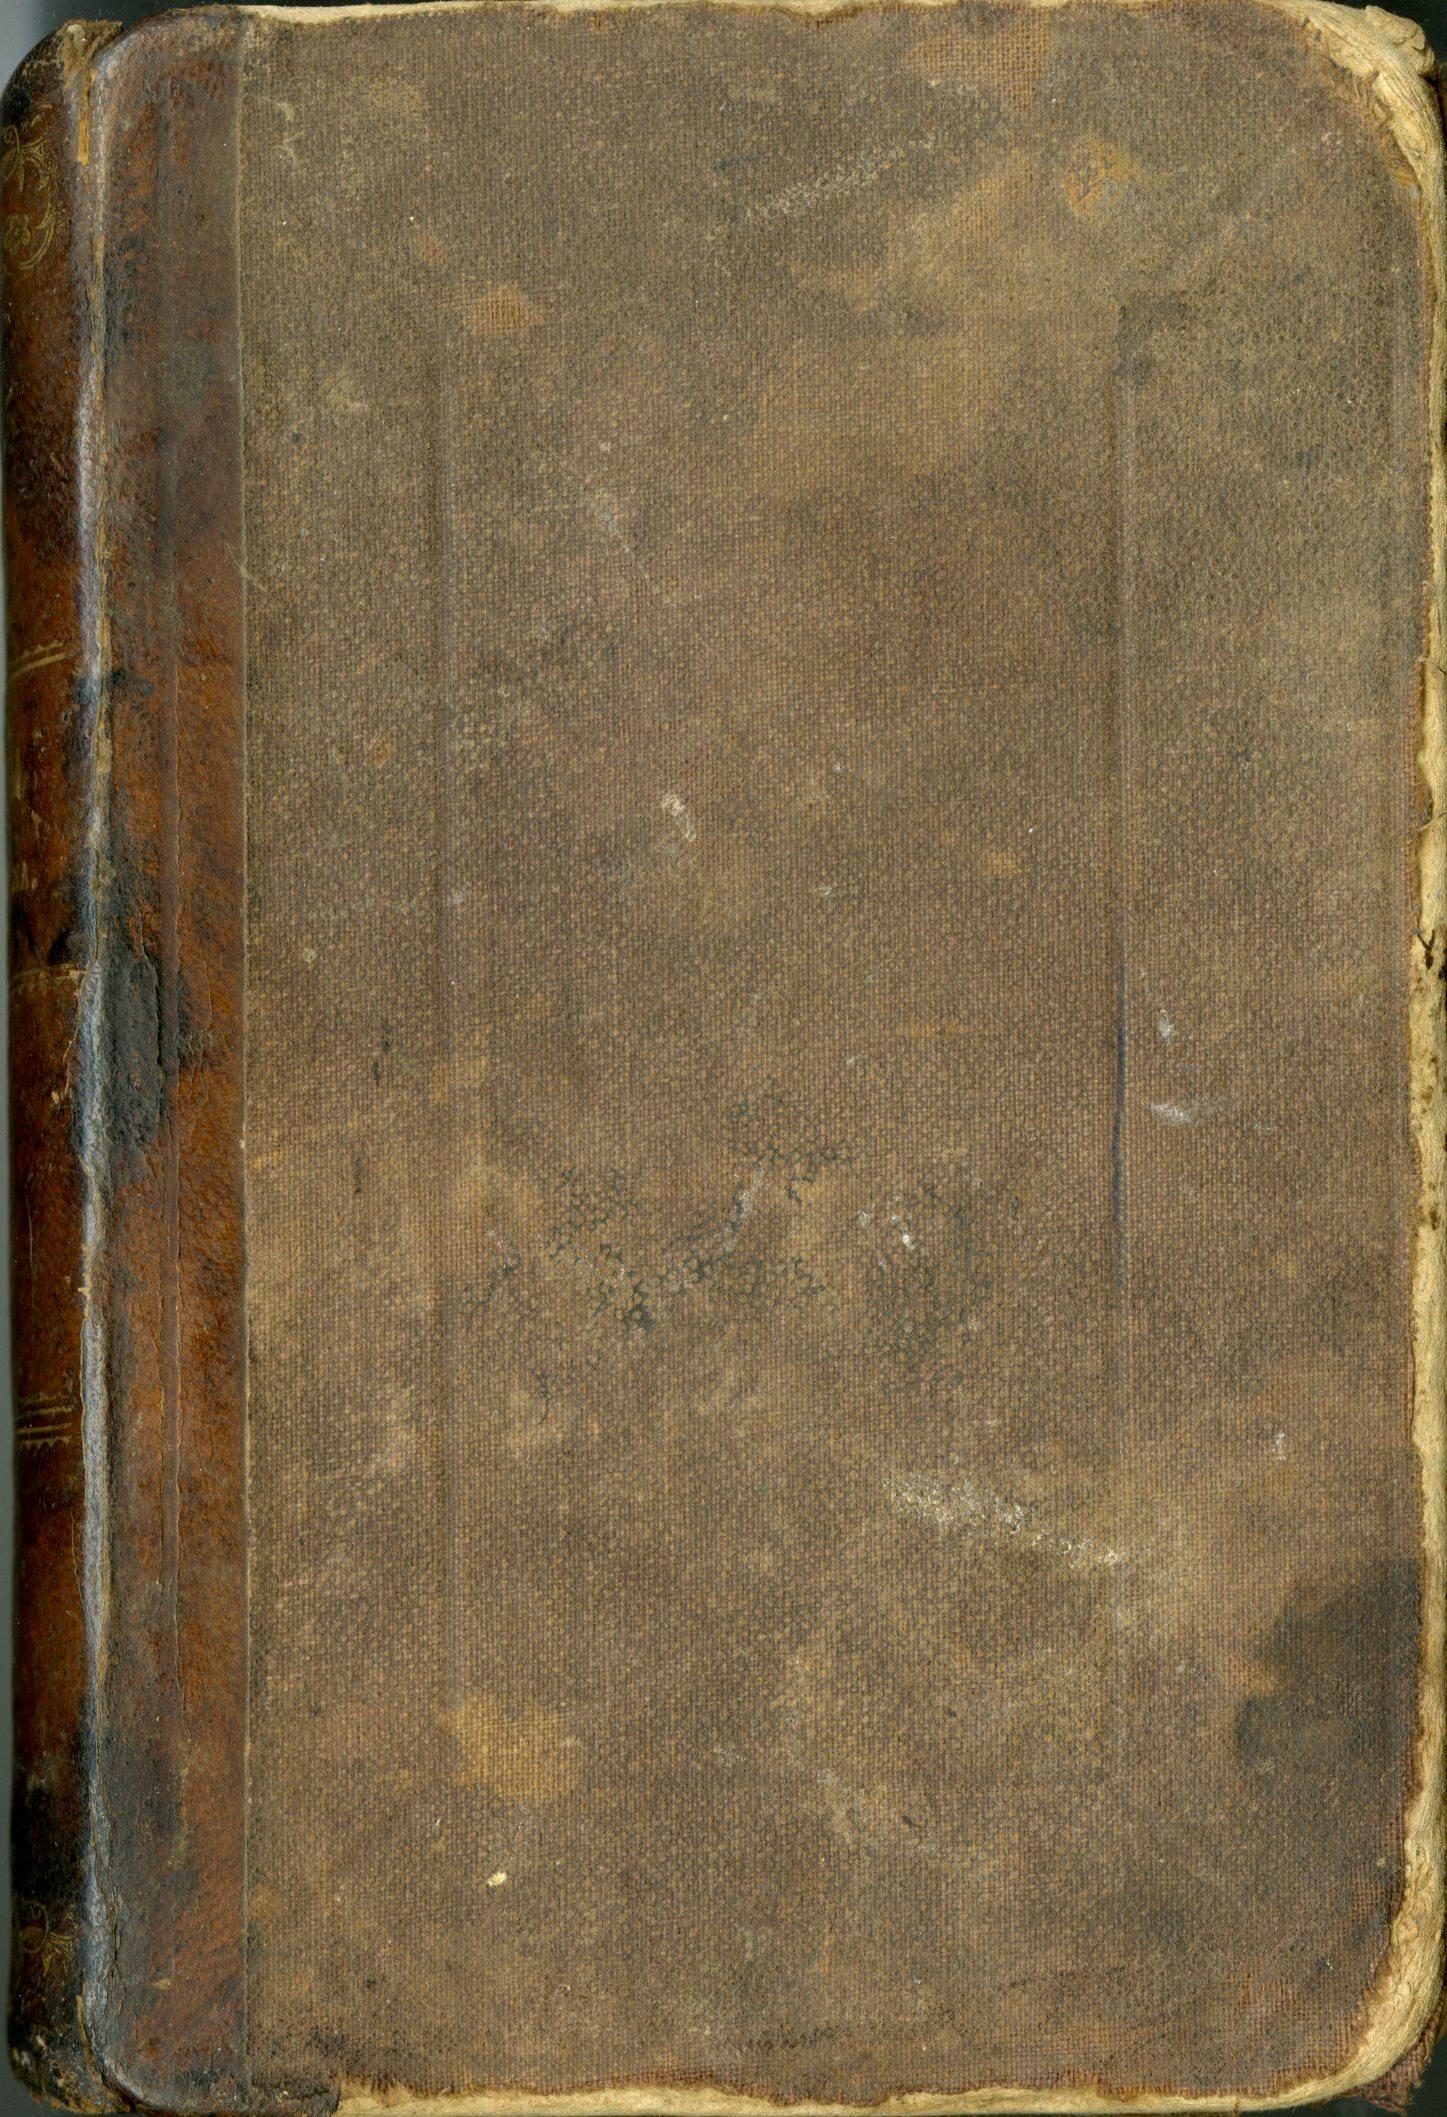 Cocinera Mexicana.(188-), Mexican Cookbook Collection, UTSA Libraries Special Collections. [TX716.M4 C6553 1880z]